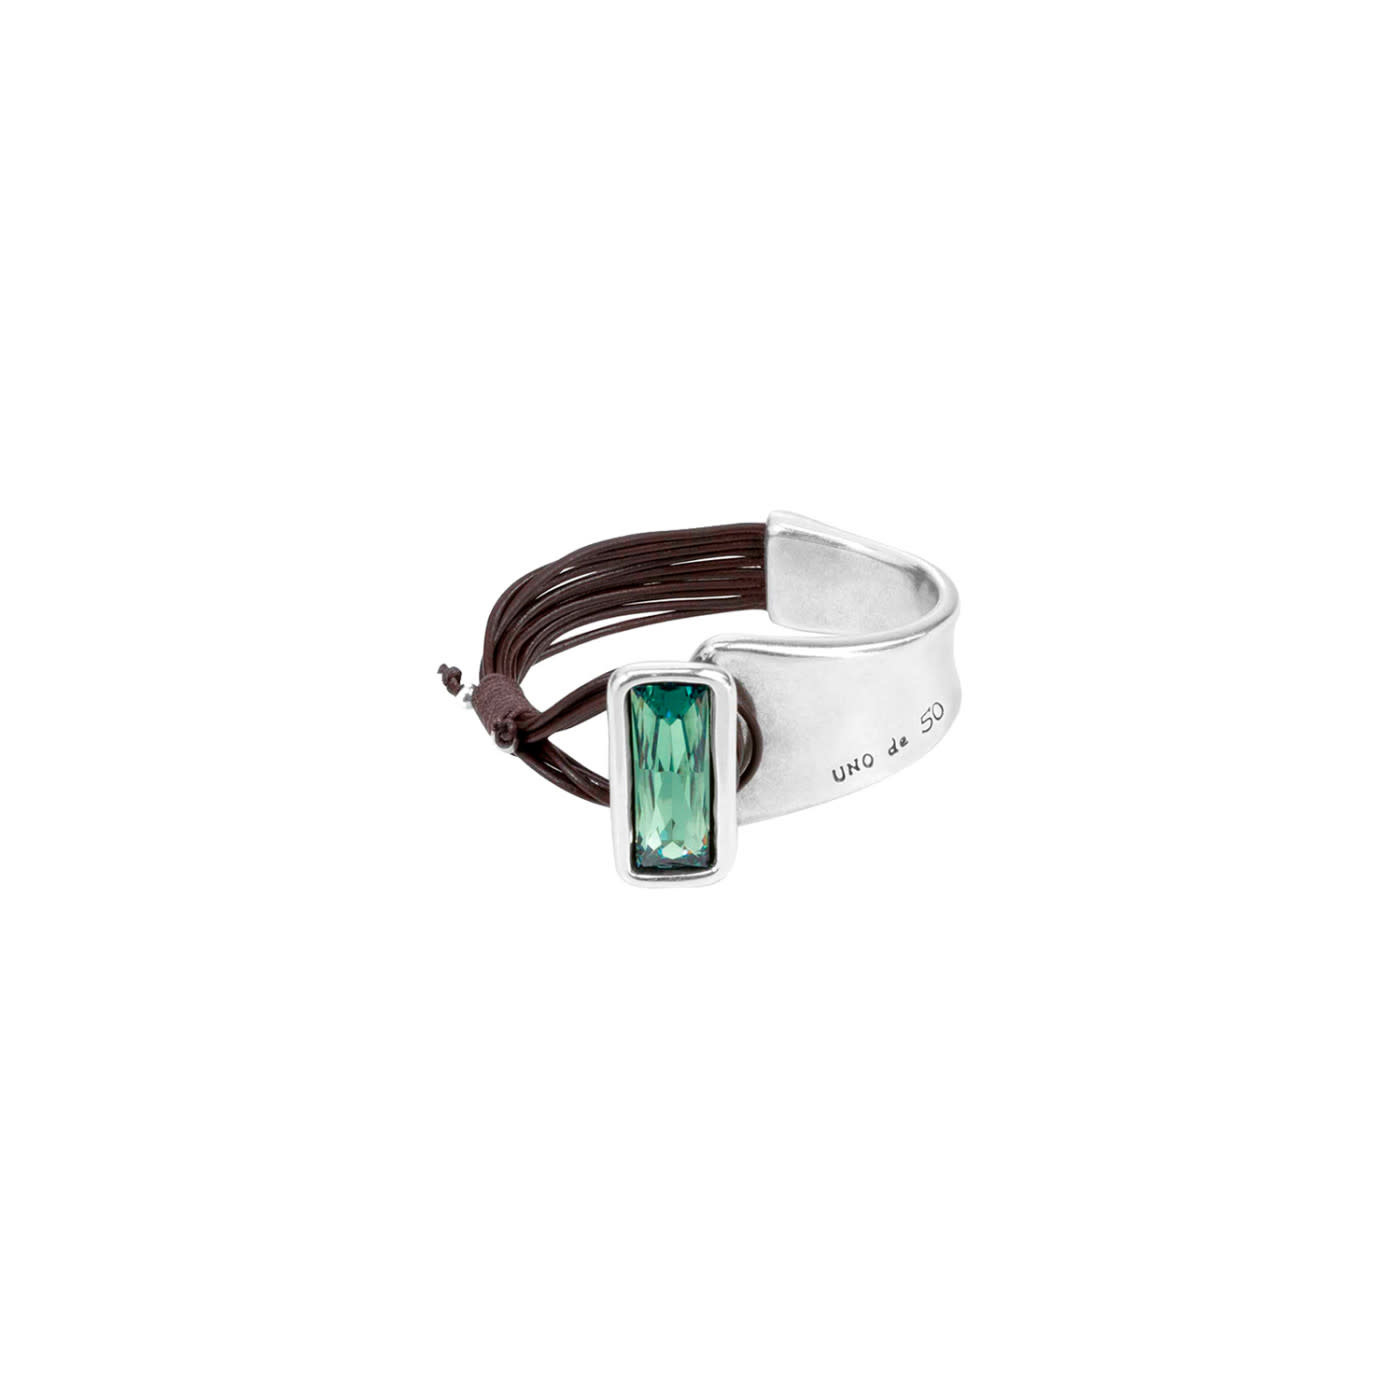 Uno de 50 AURORA BOREALIS Bracelet